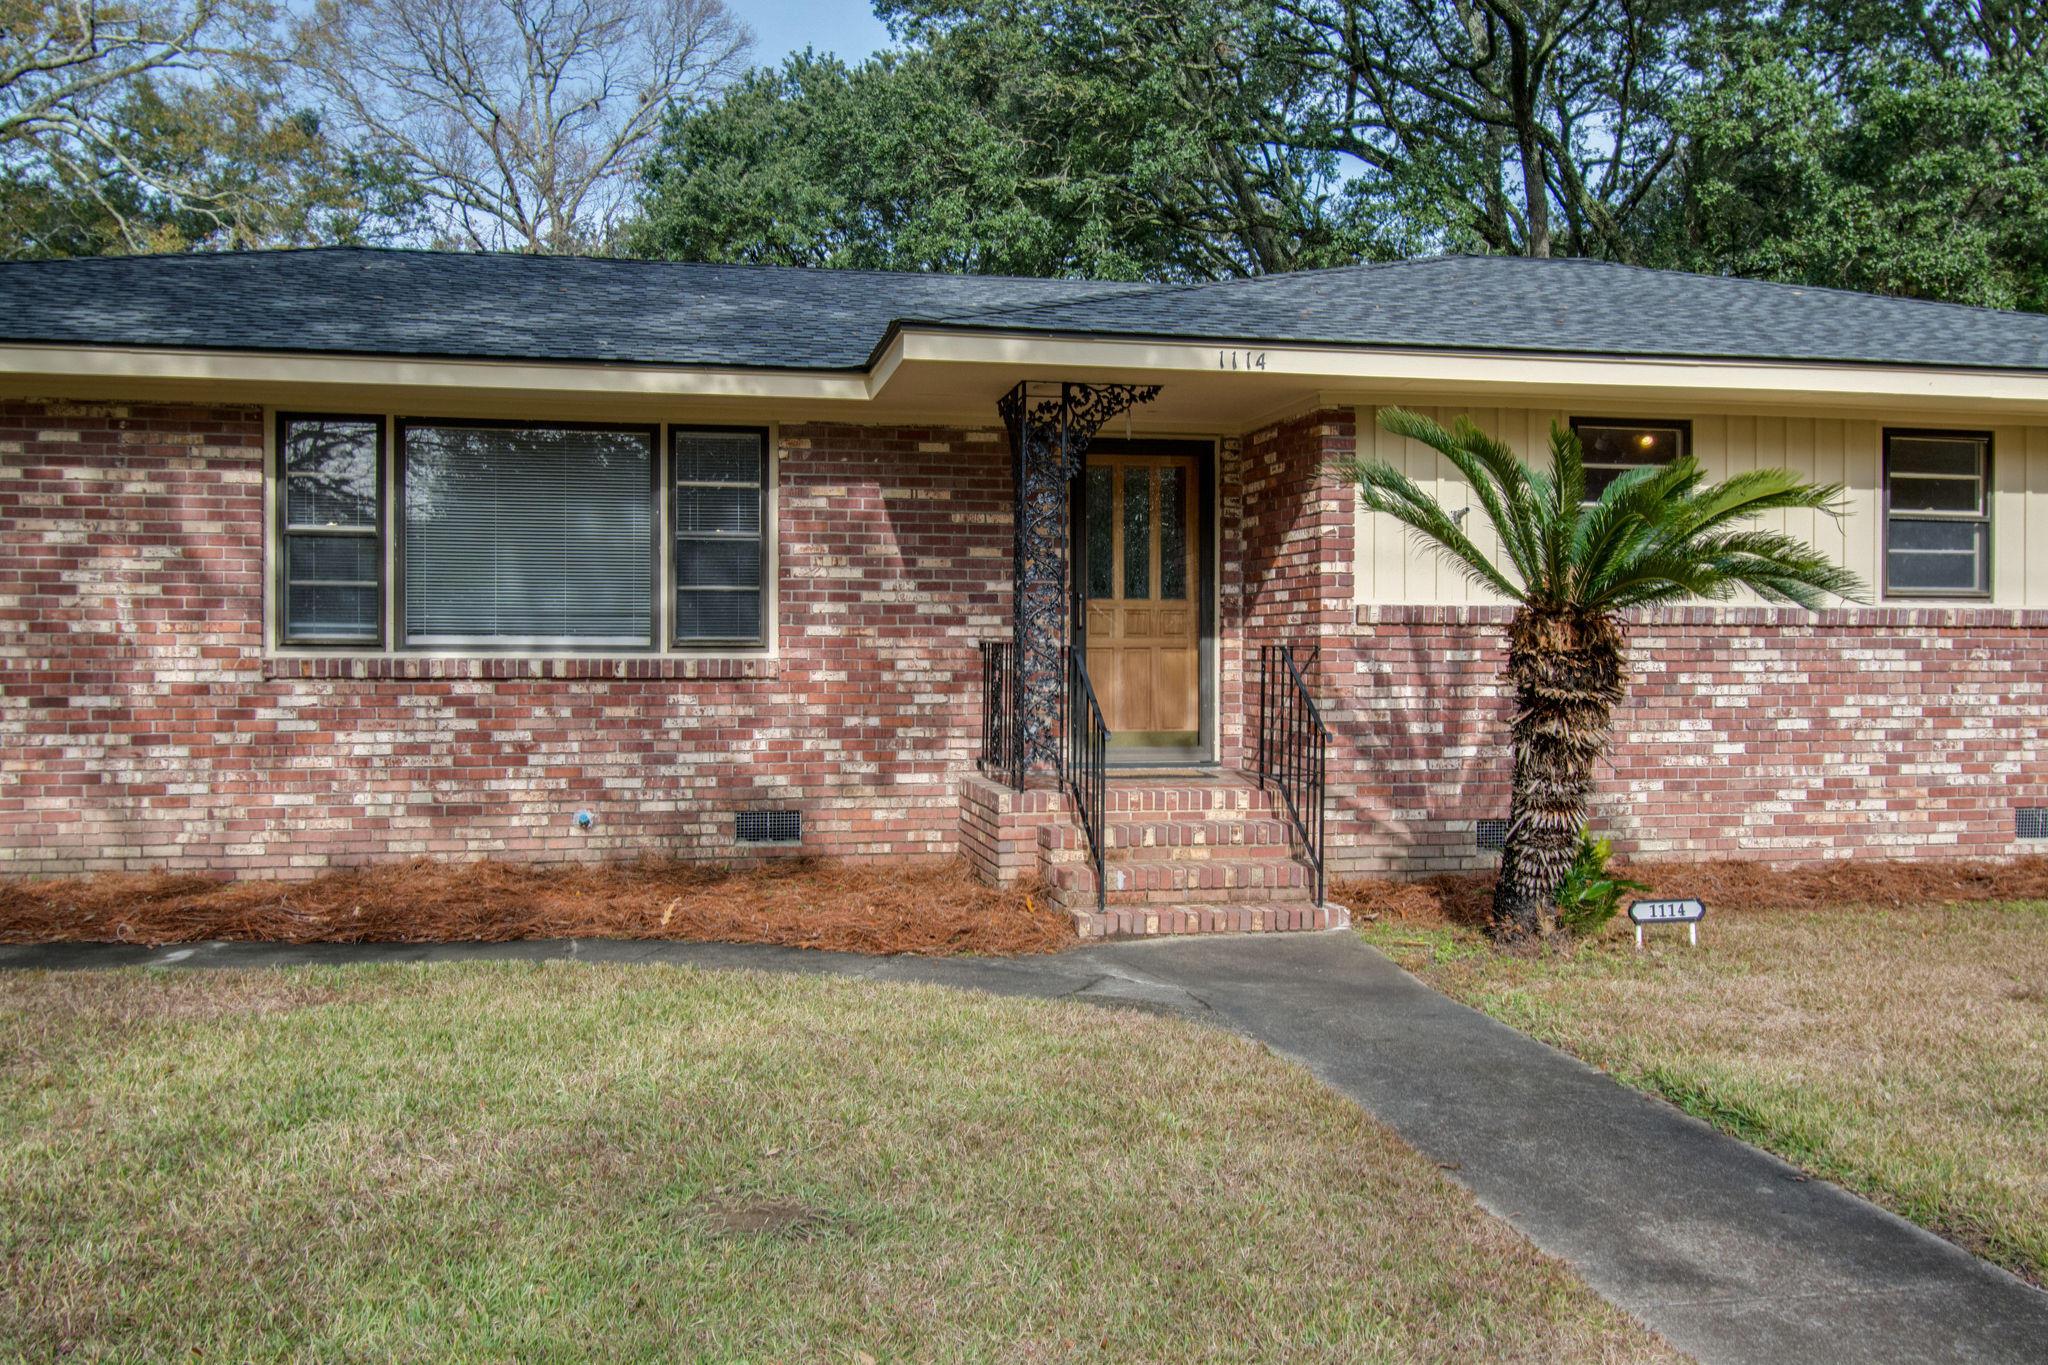 Northbridge Terrace Homes For Sale - 1114 Northbridge, Charleston, SC - 0